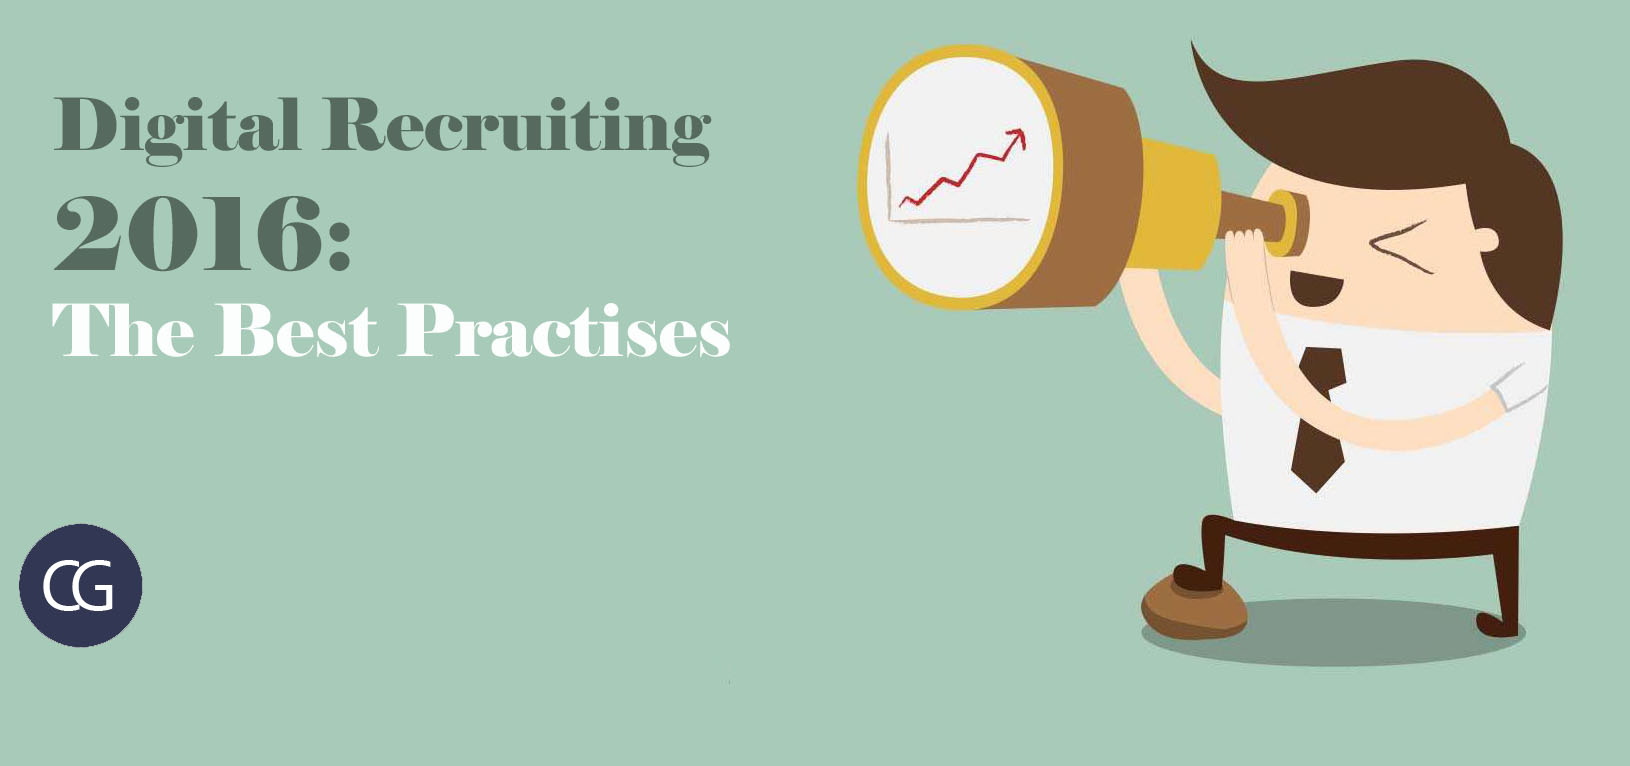 Digital Recruiting 2016: The Best Practises